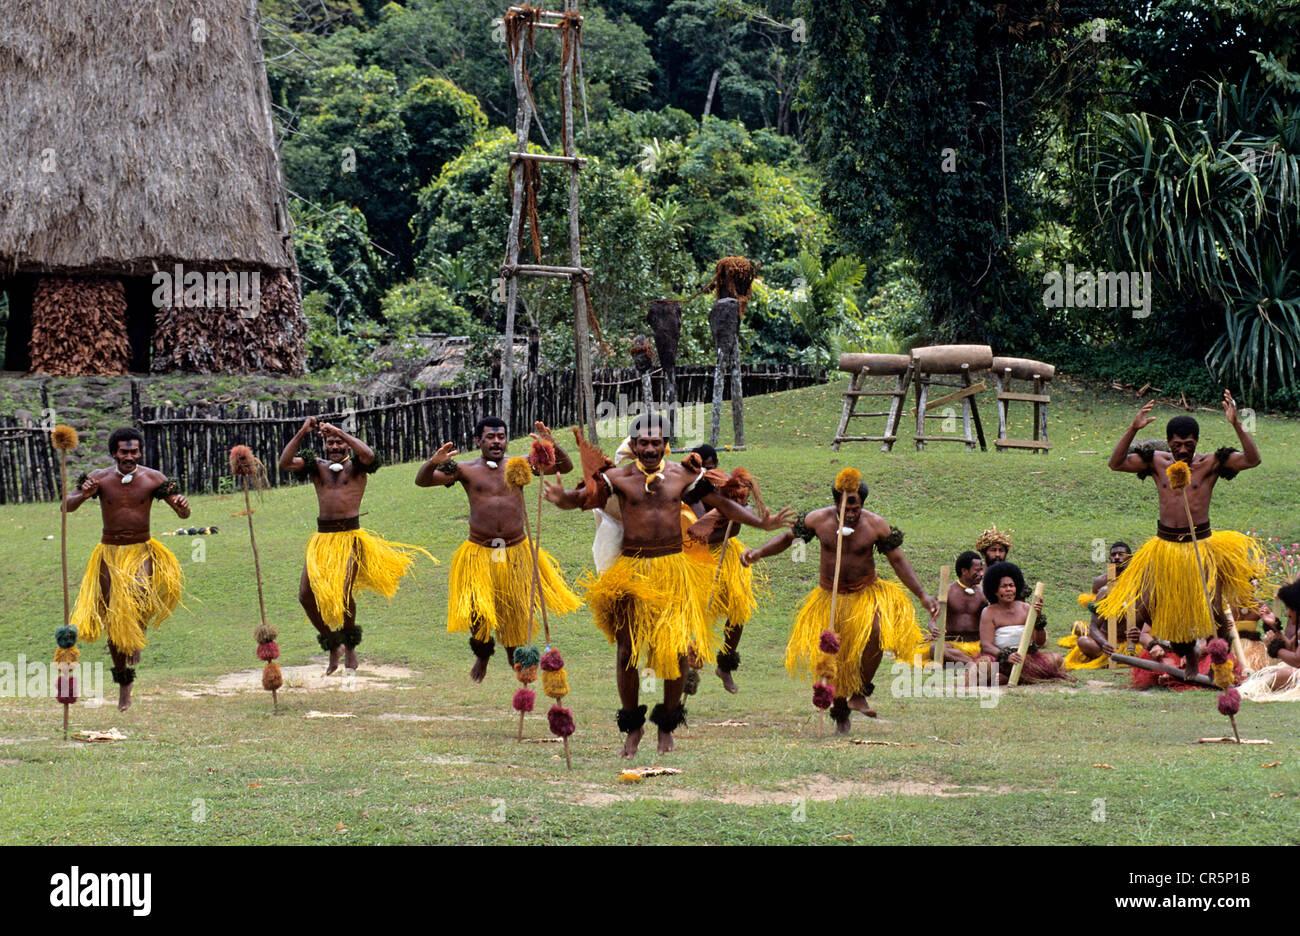 Fiji Meke Dance Stock Photos & Fiji Meke Dance Stock Images - Alamy